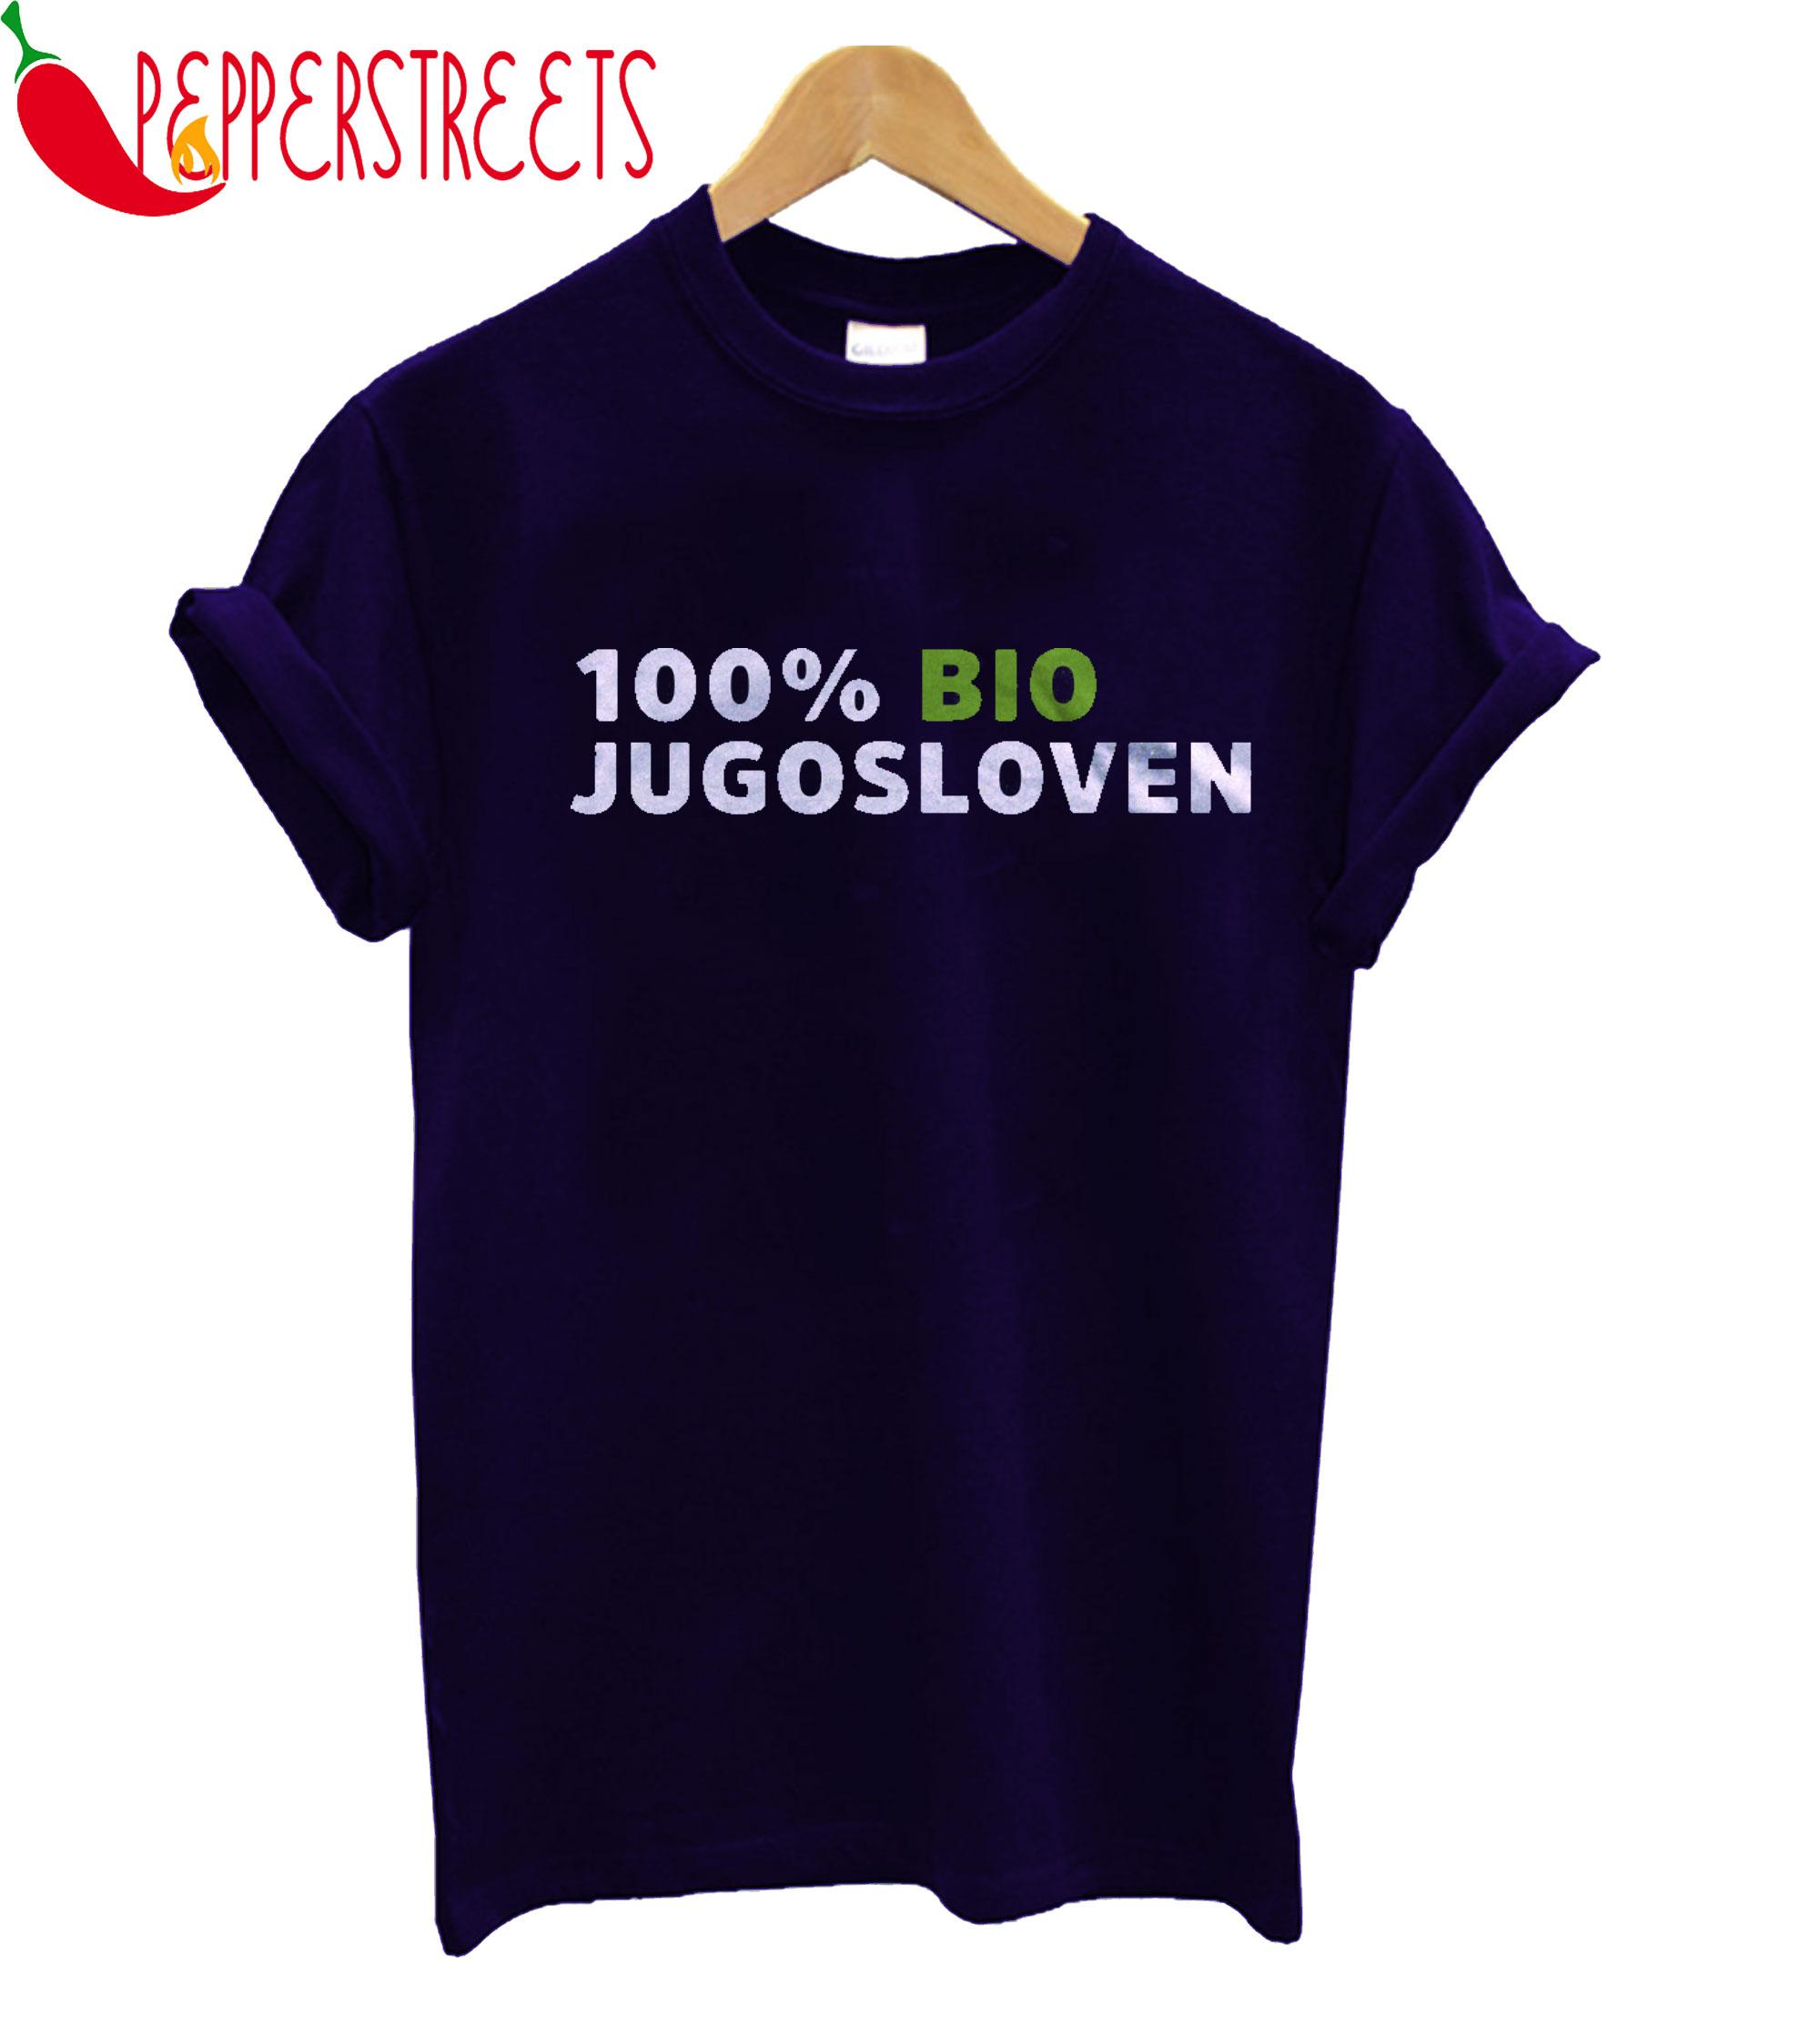 100% Bio Jugosloven T-Shirt